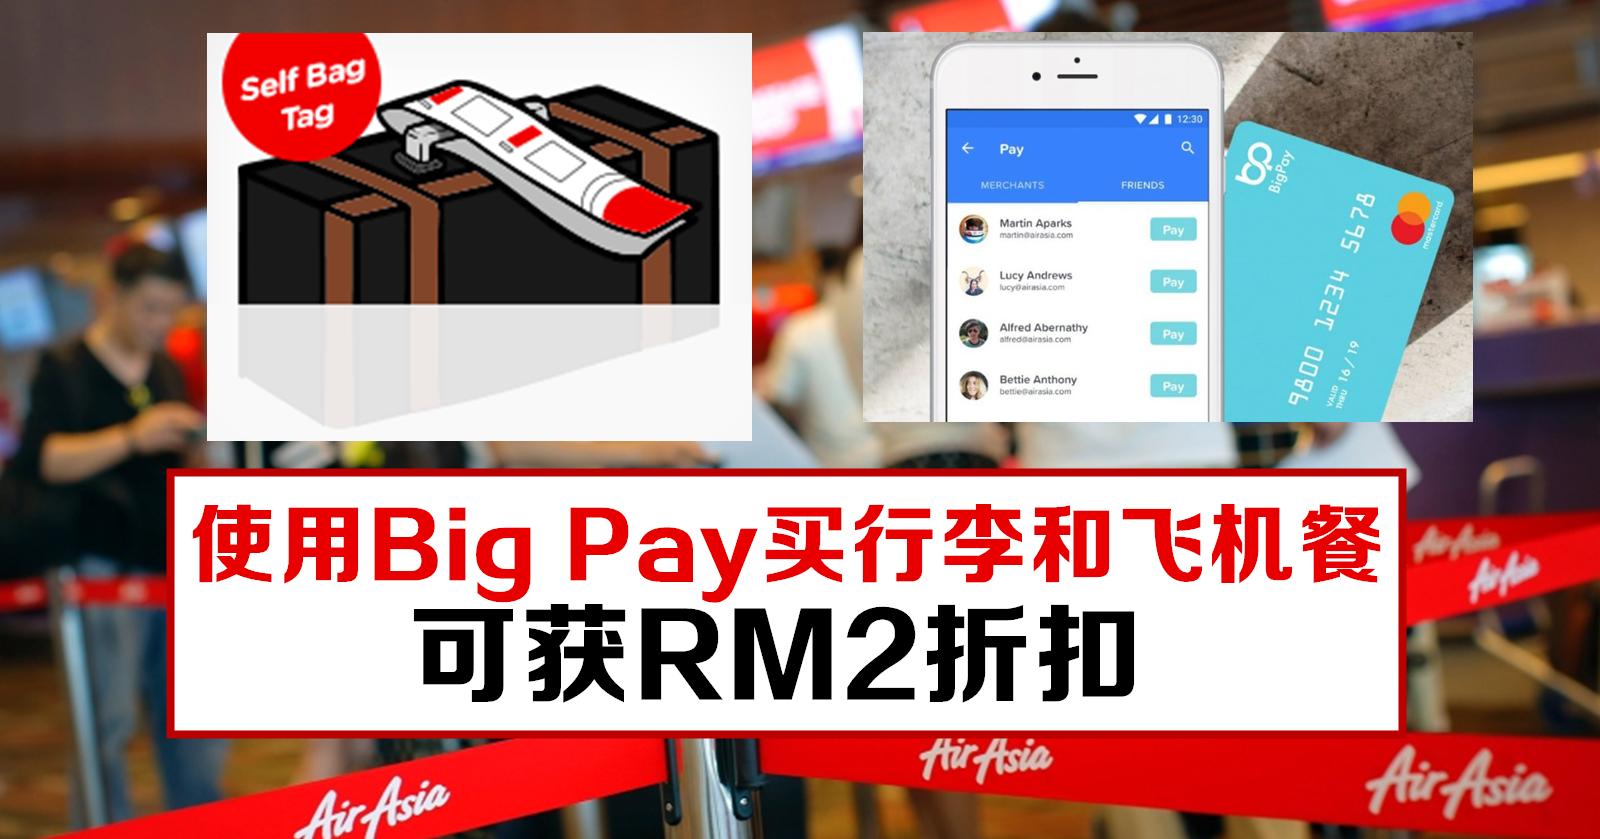 使用Big Pay買行李和飛機餐可獲RM2折扣 - WINRAYLAND